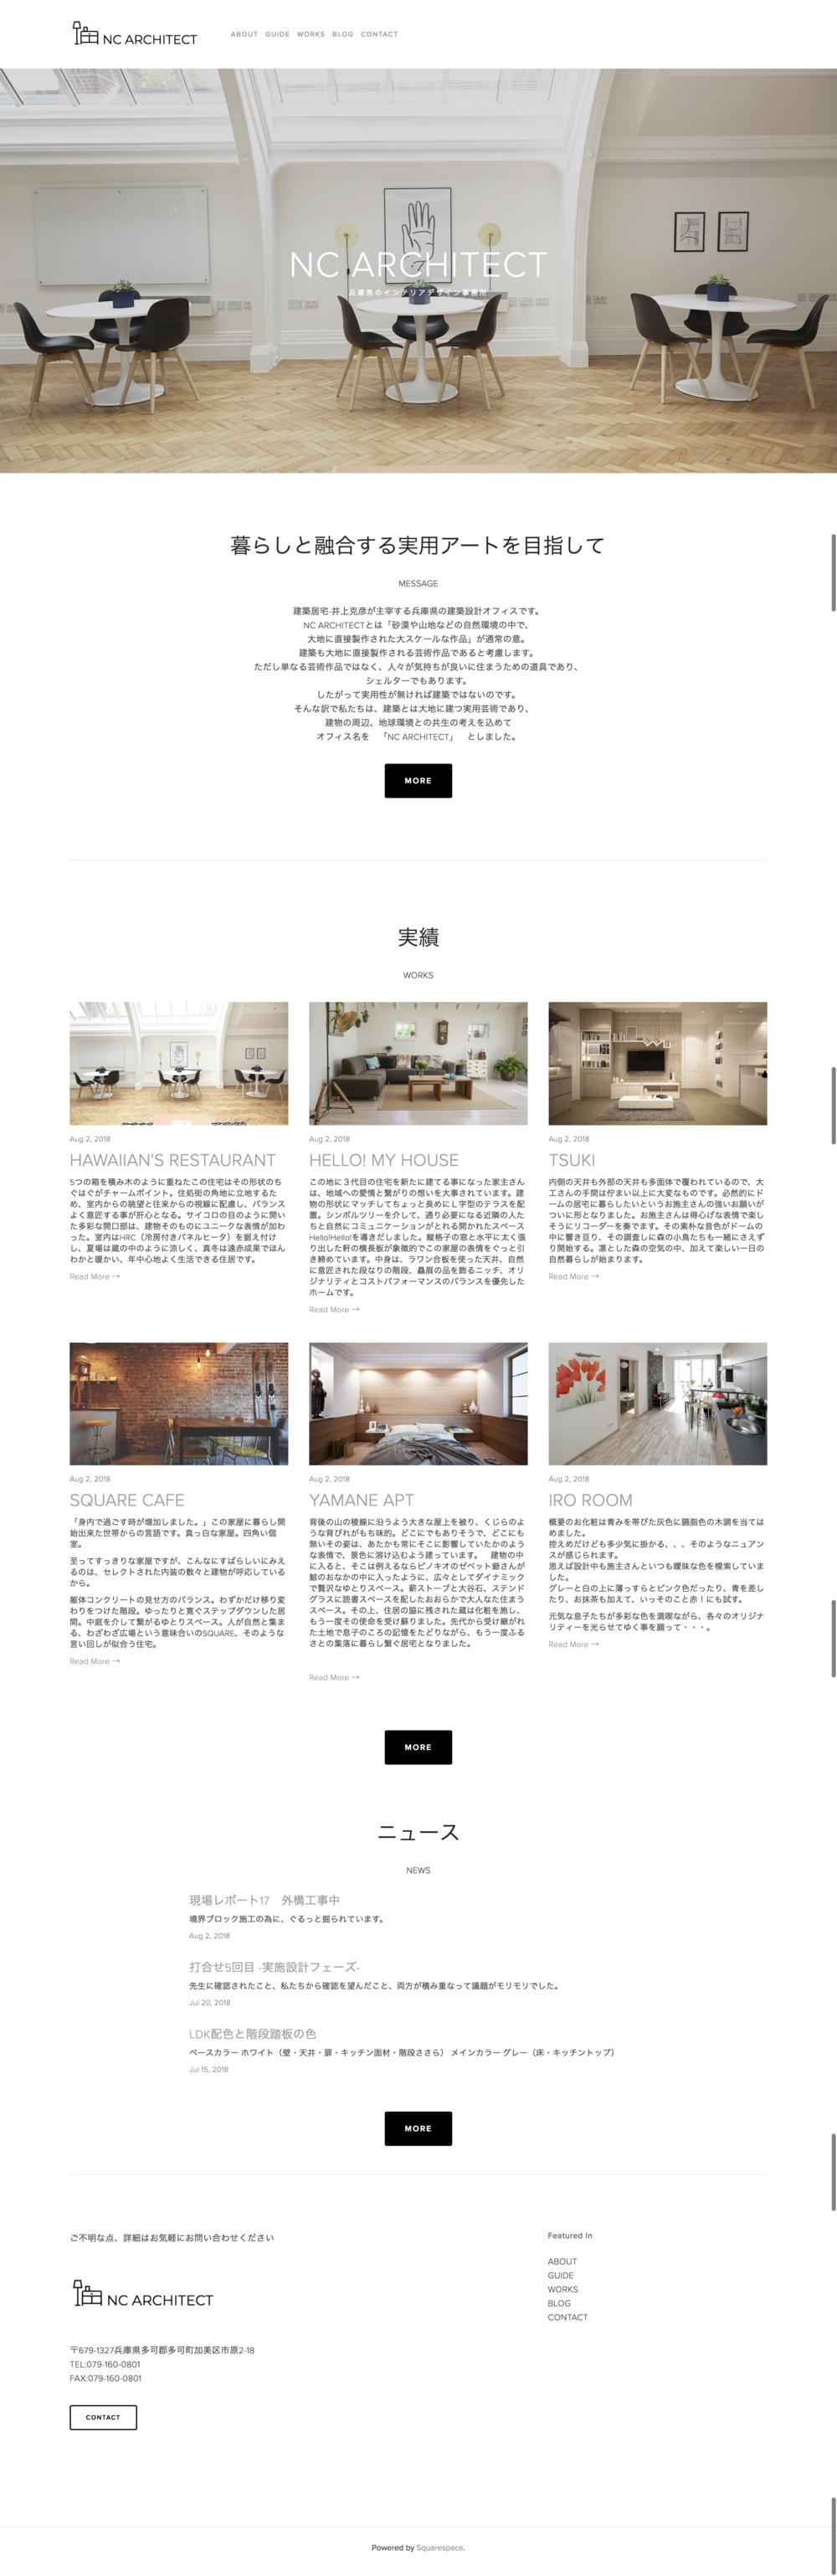 NC ARCHITECT  初期費用:¥98,000(税別)〜 年間維持費:約¥20,000(税別)〜